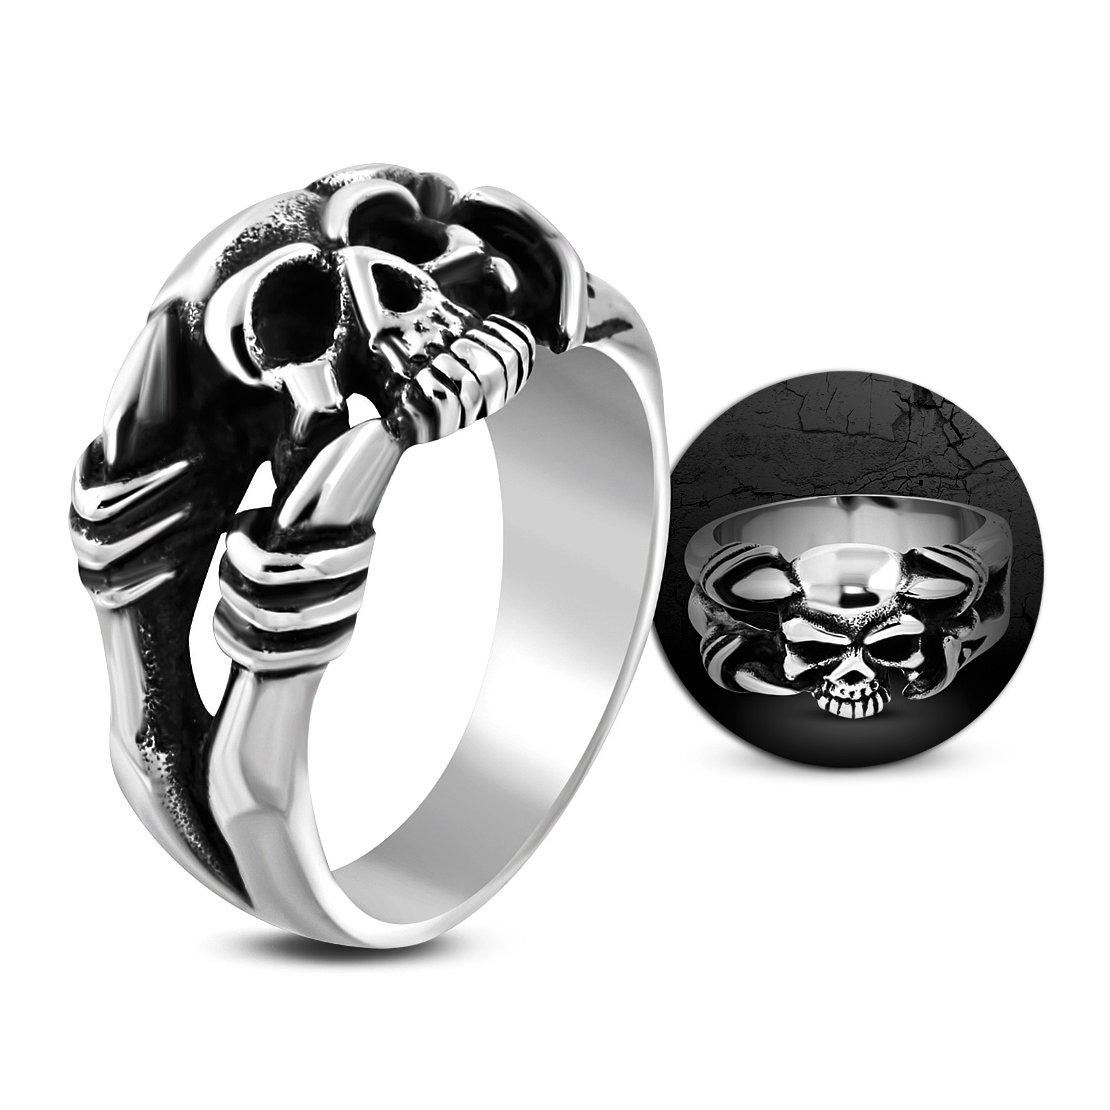 Stainless Steel 2 Color Ghost Skull Skeleton Hand Claw Biker Ring